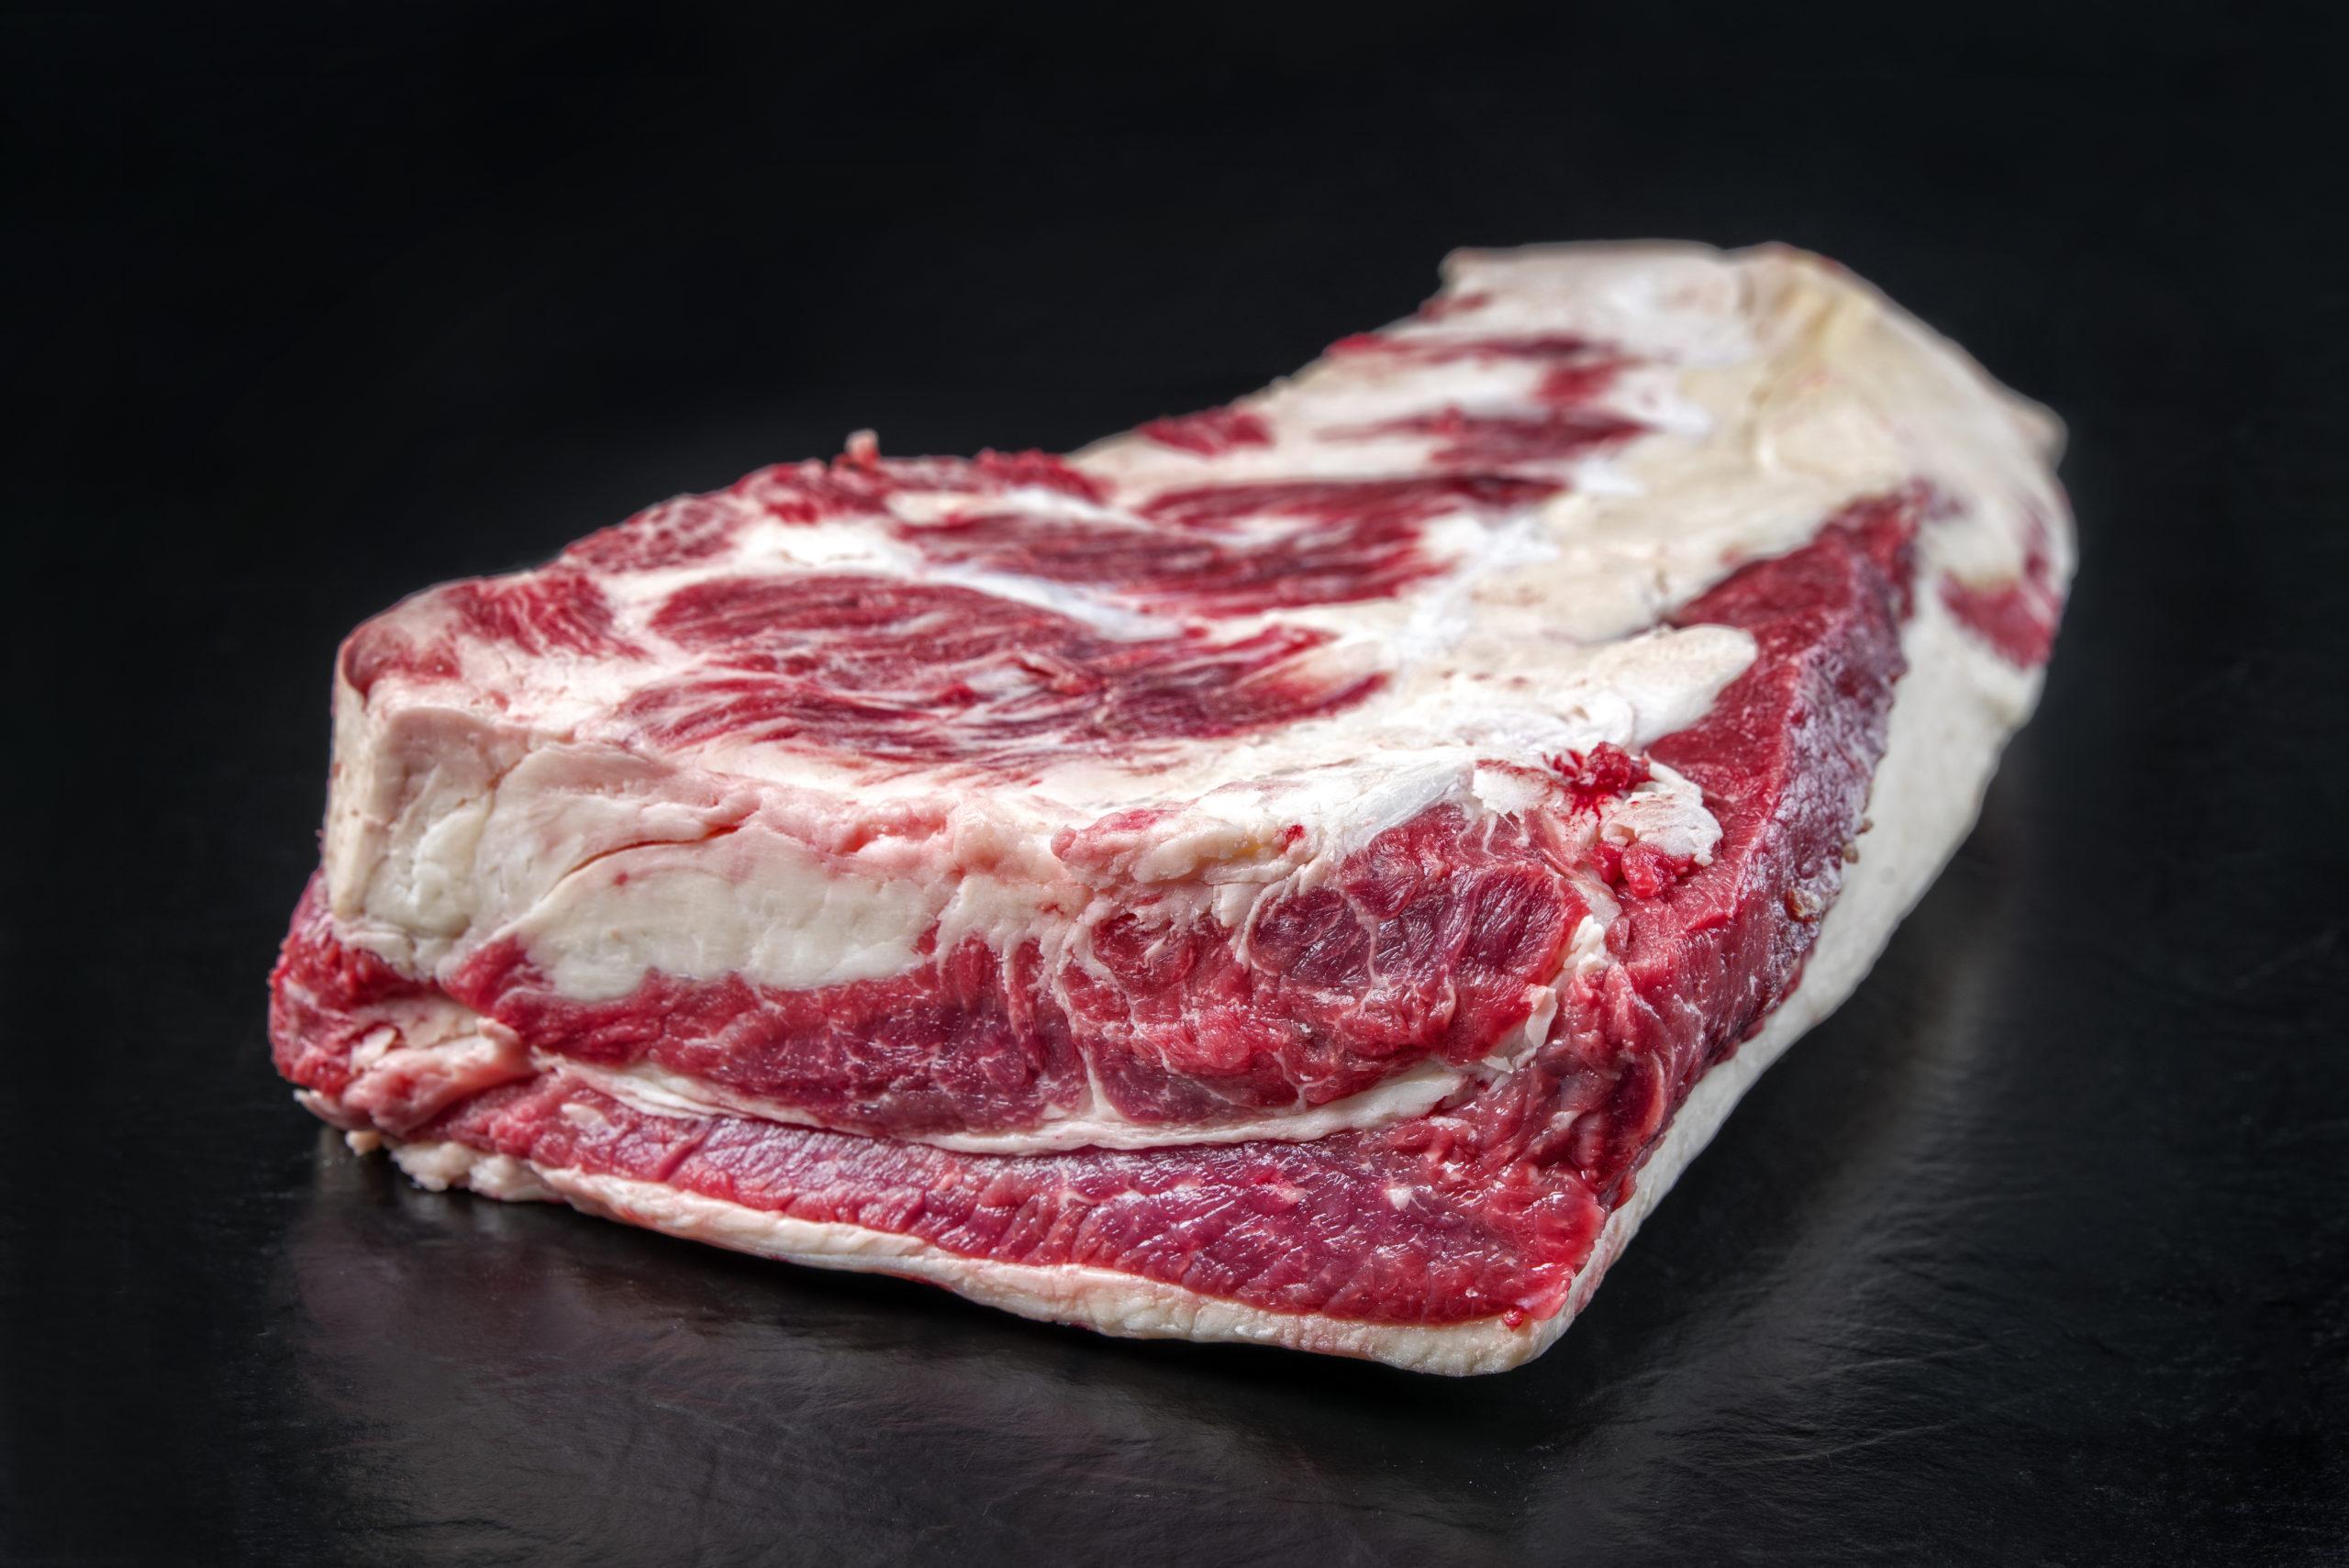 Brisket Cut - เนื้อติดหน้าอก